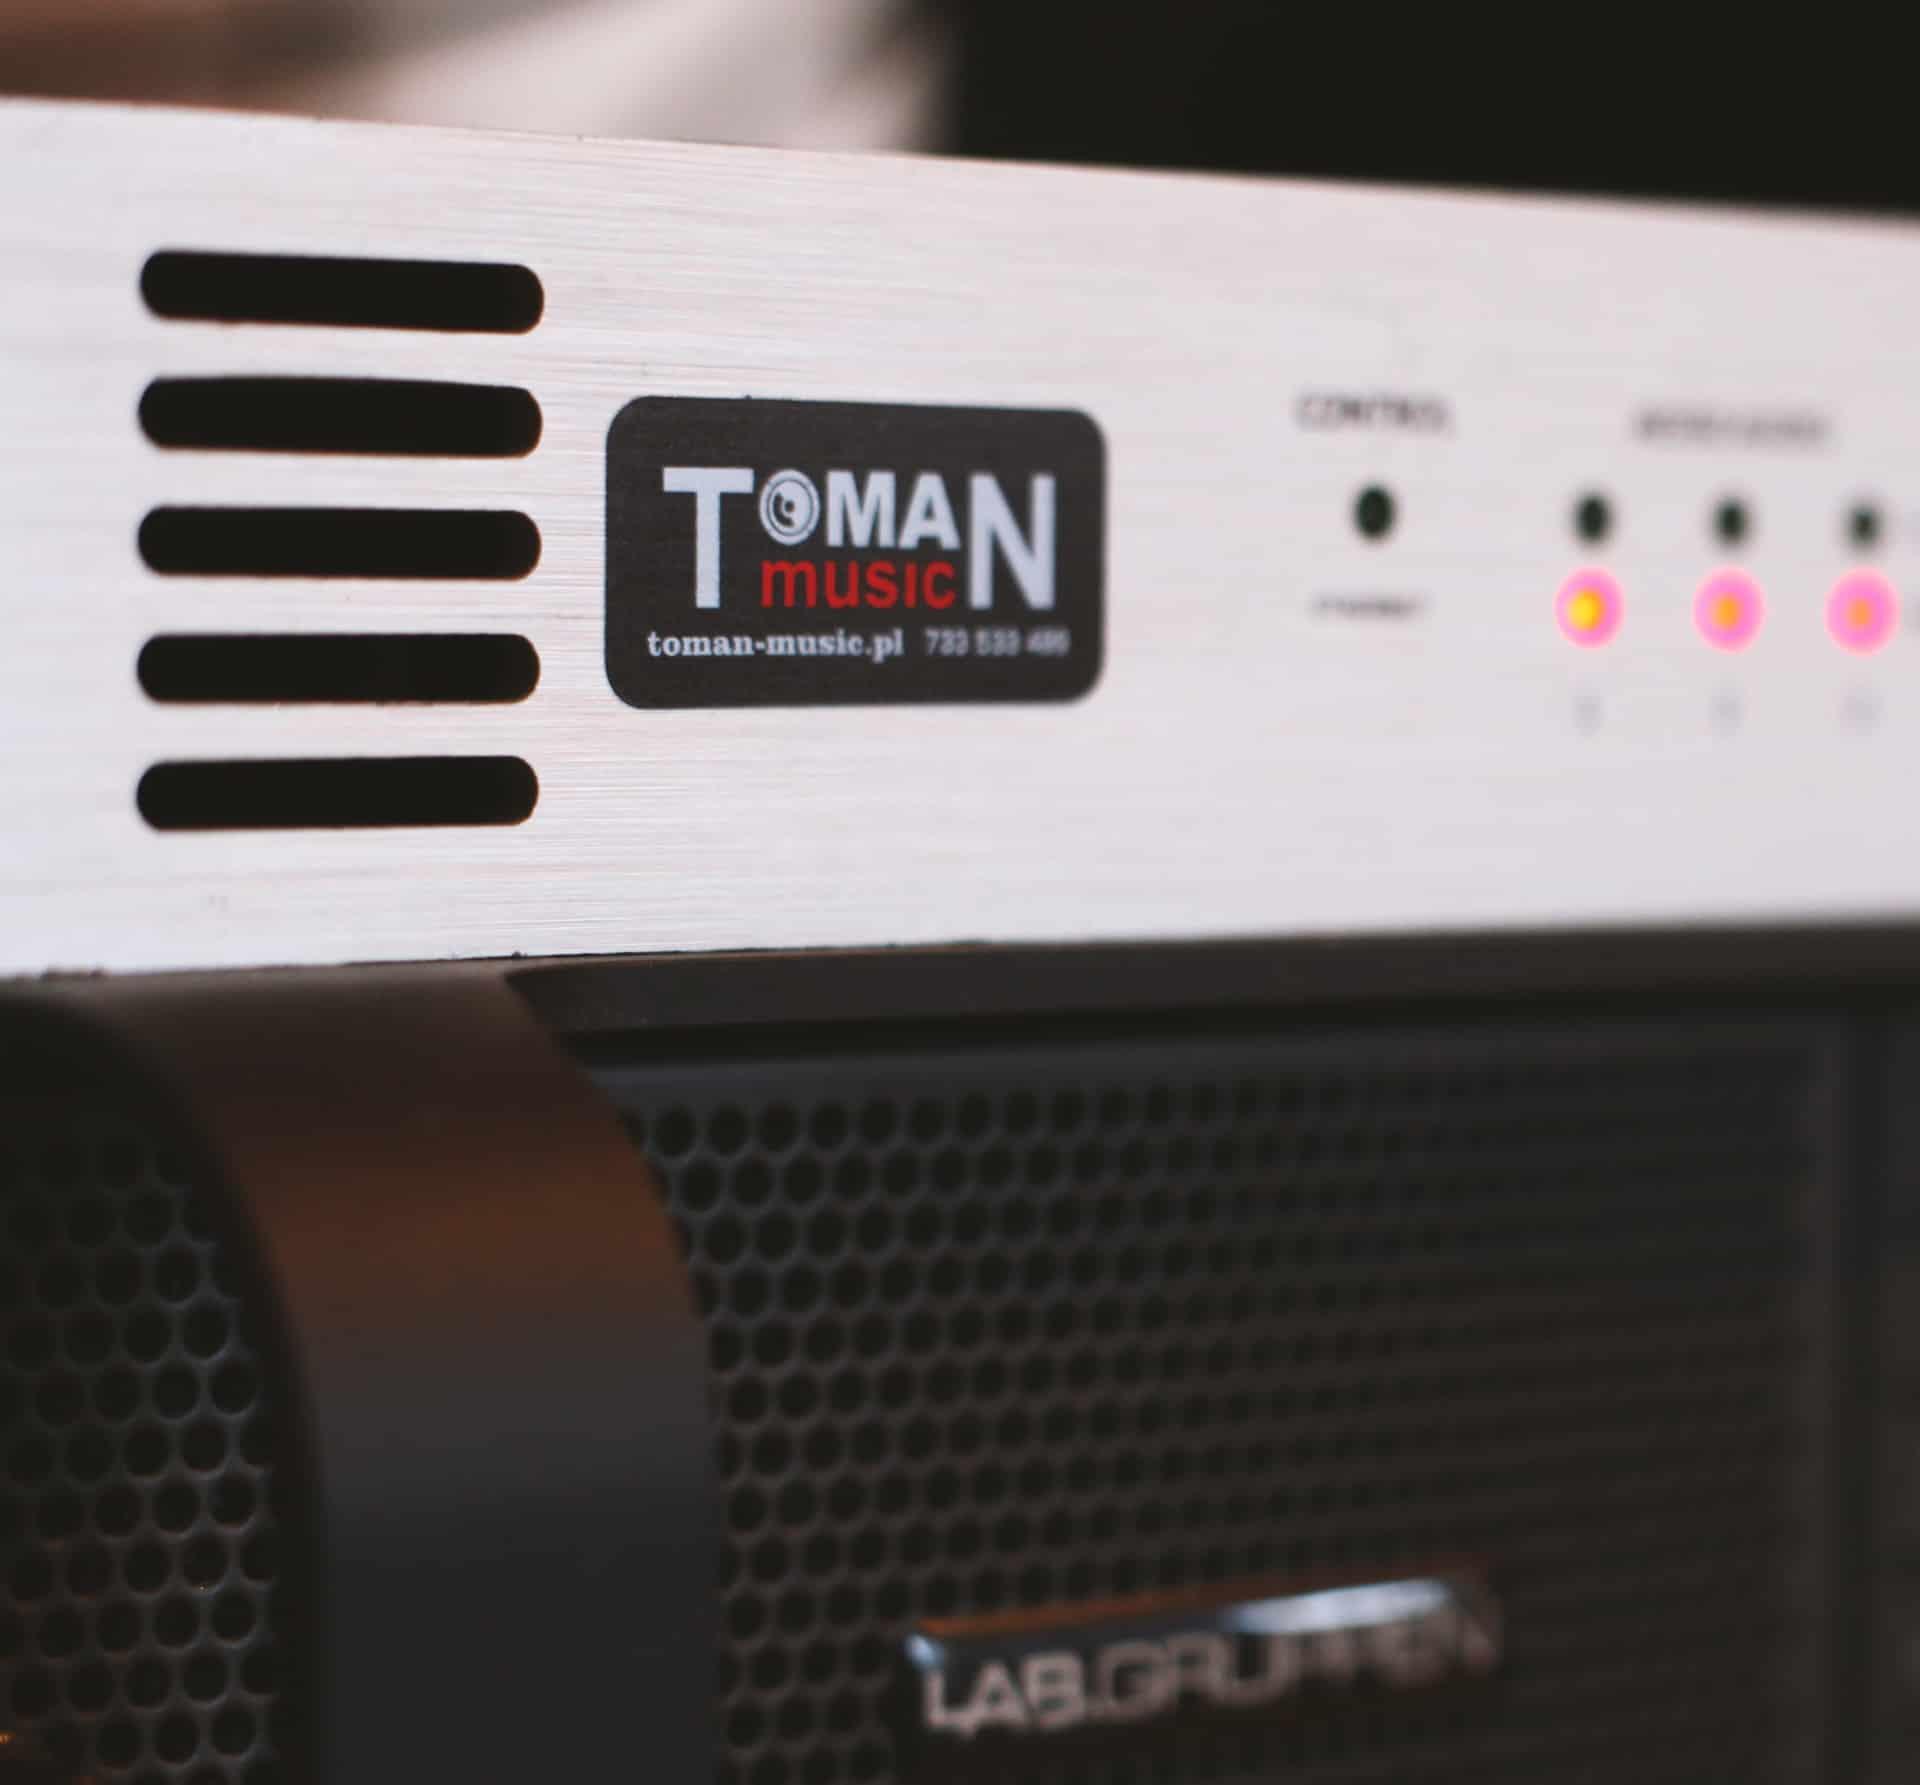 naklejki z logo Toman music